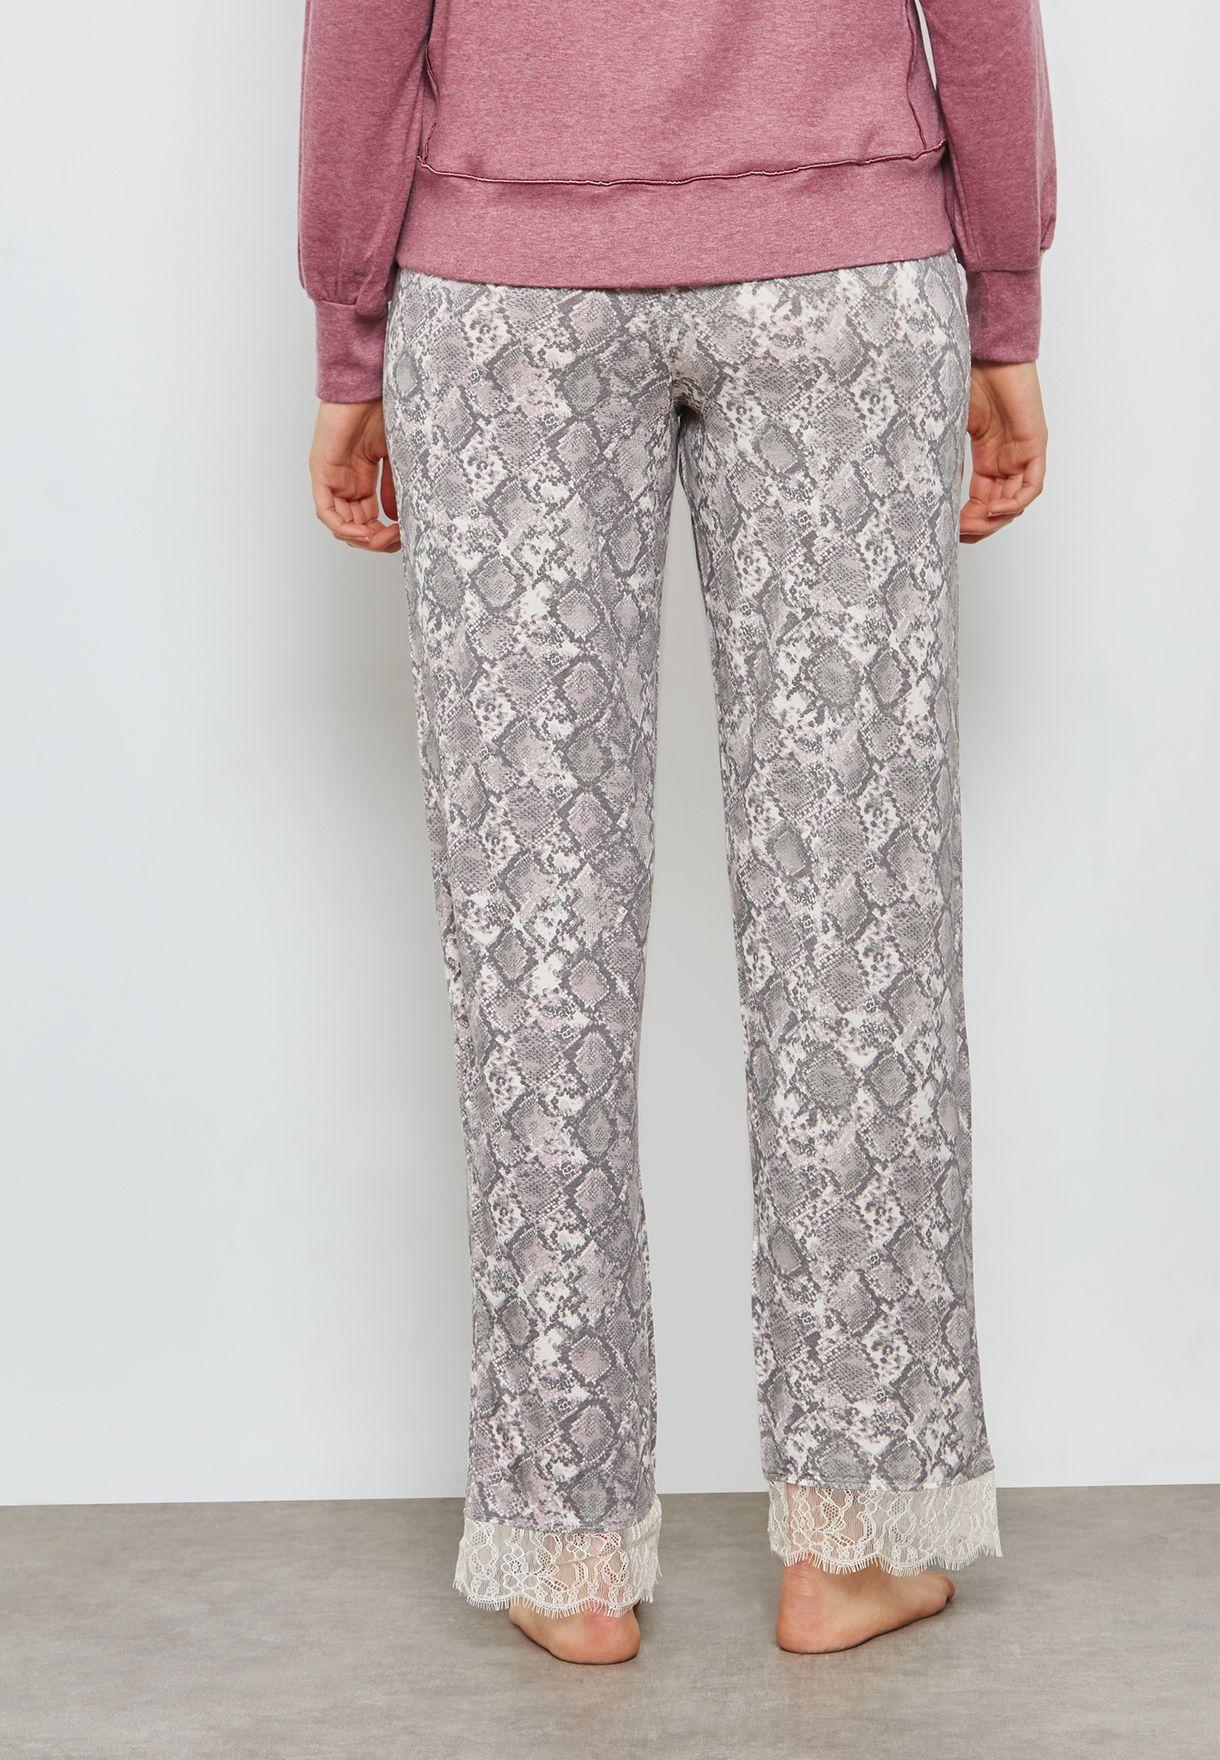 97cc6cefaa88 Shop New Look prints Pink Snake Print Lace Trim Pyjama Bottoms ...